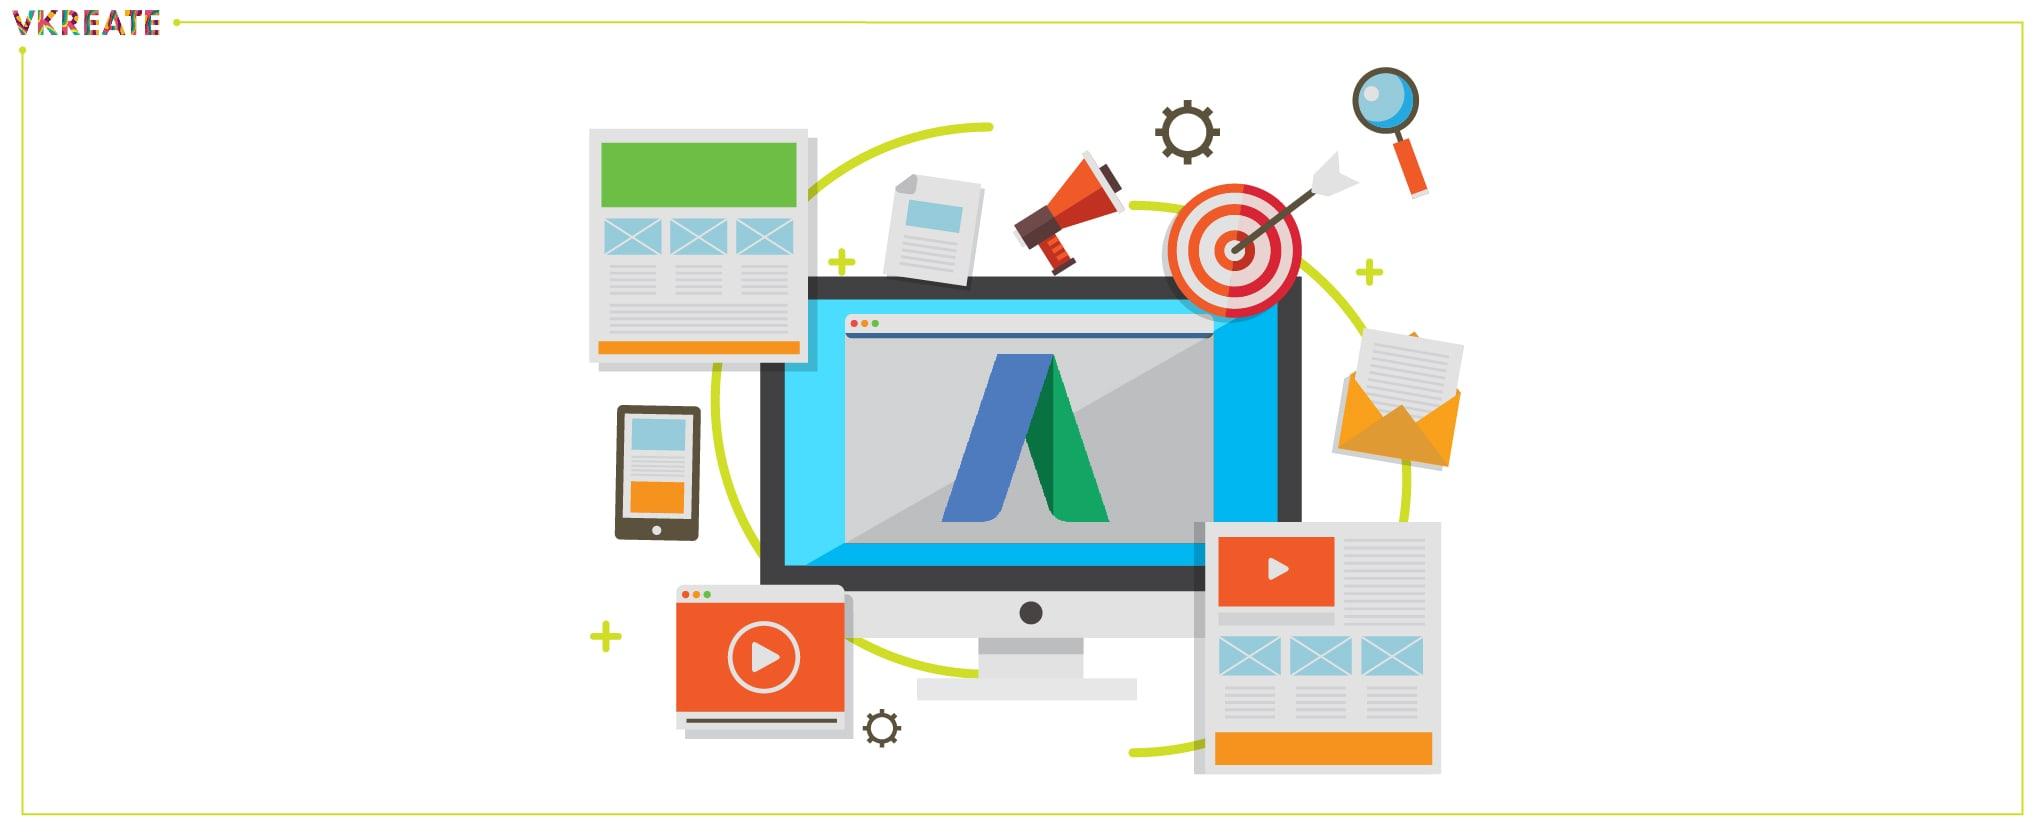 Want to Run a Successful Google Ad Campaign? Google Ad Campaign Tips.